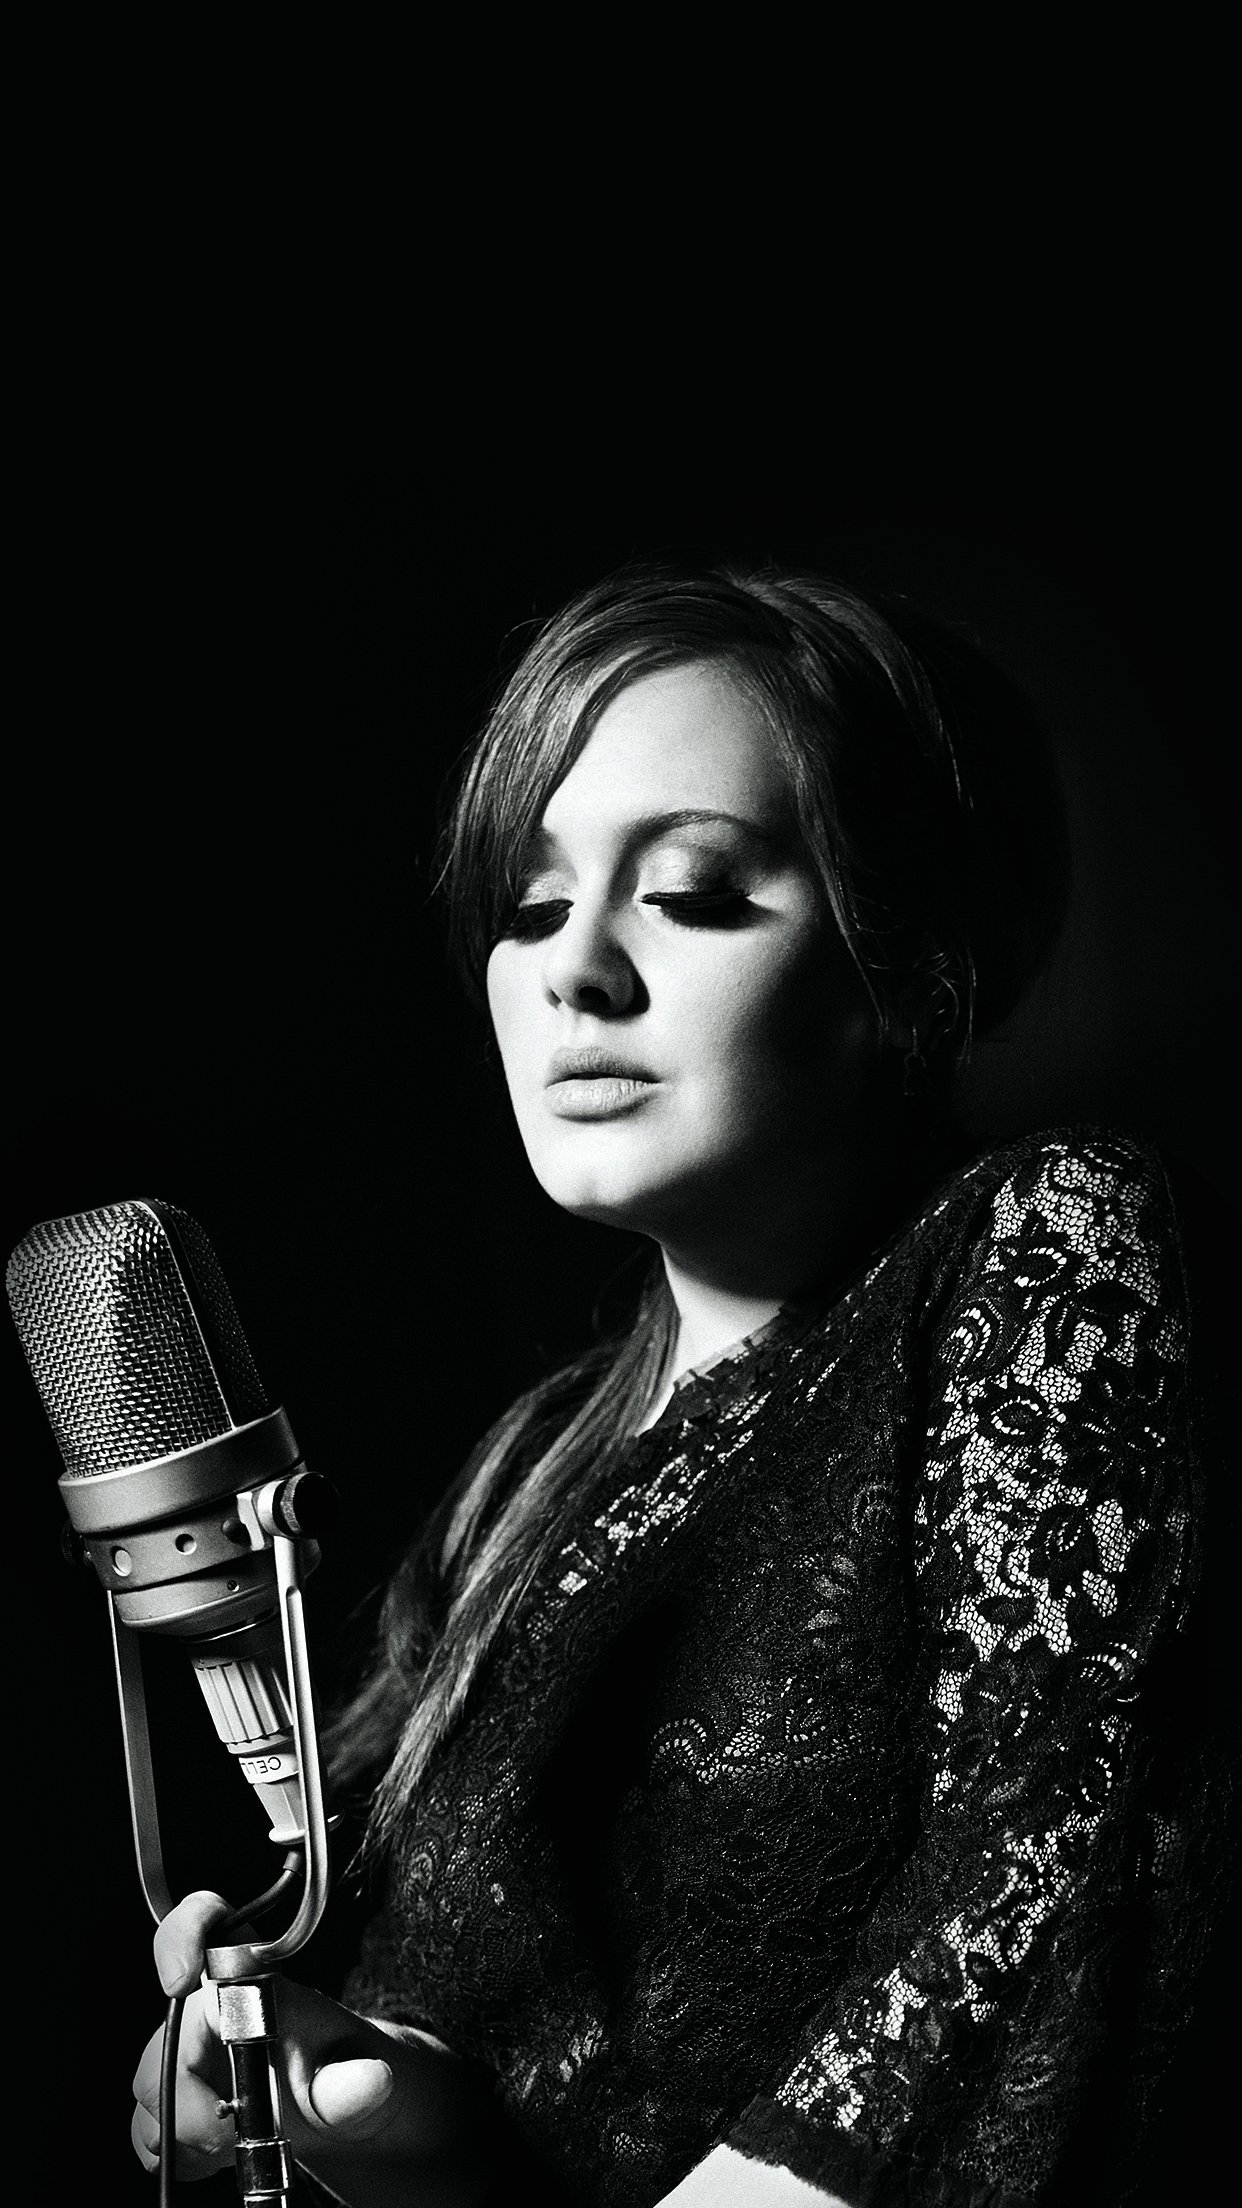 8 Best Adele images | Singers, Adele adkins, Celebs